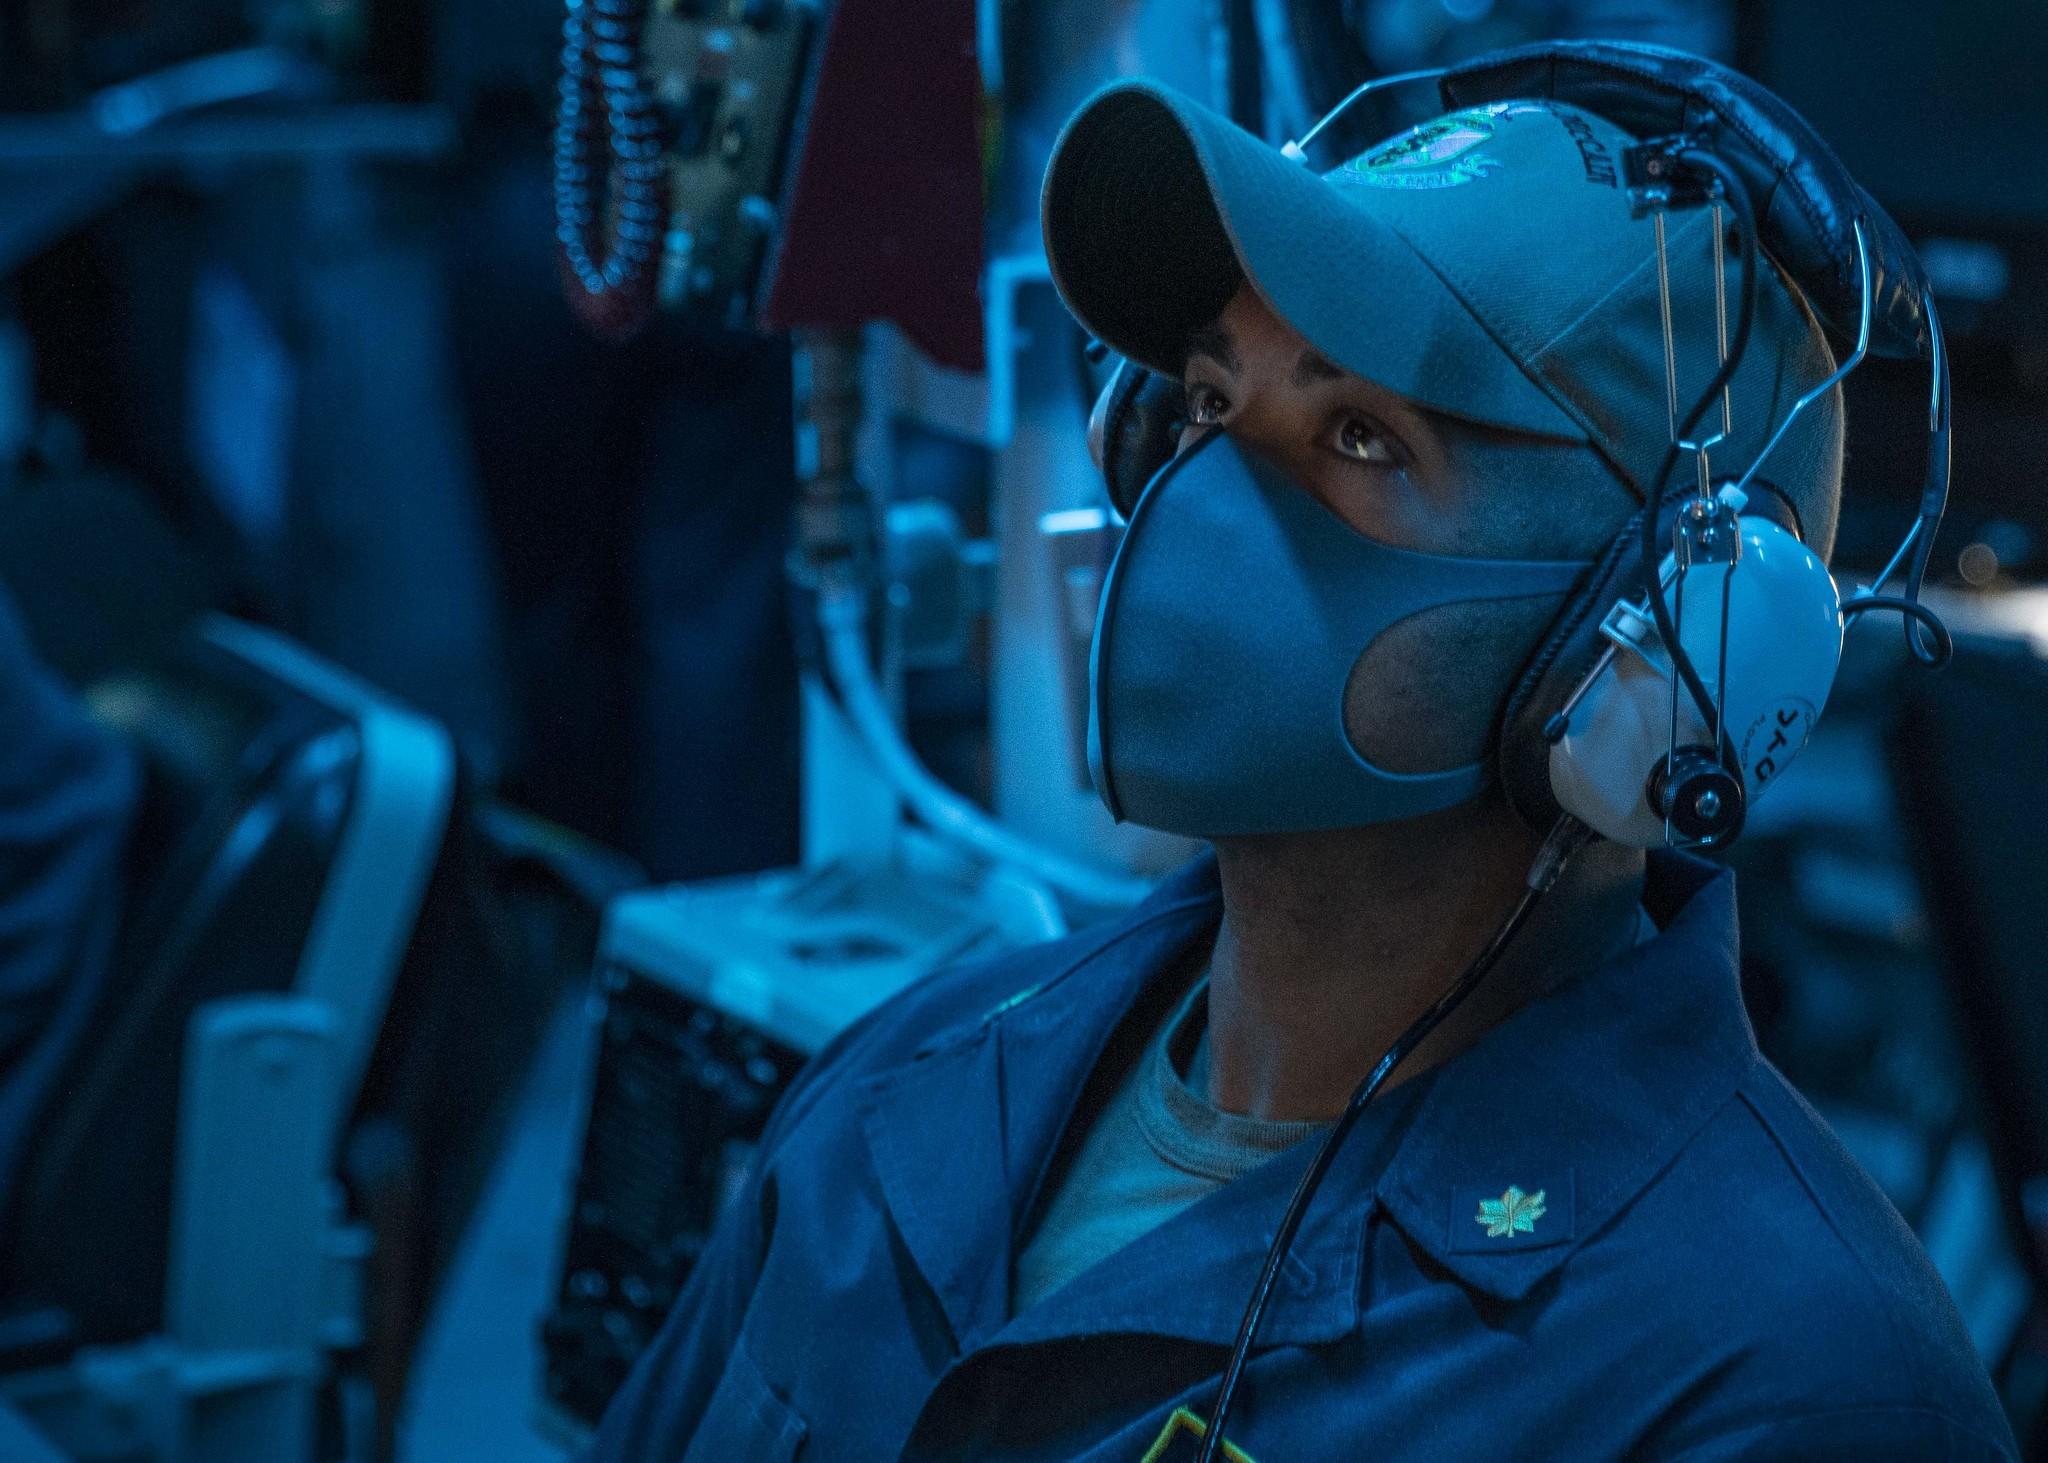 us navy japan navy1 - Naval Post